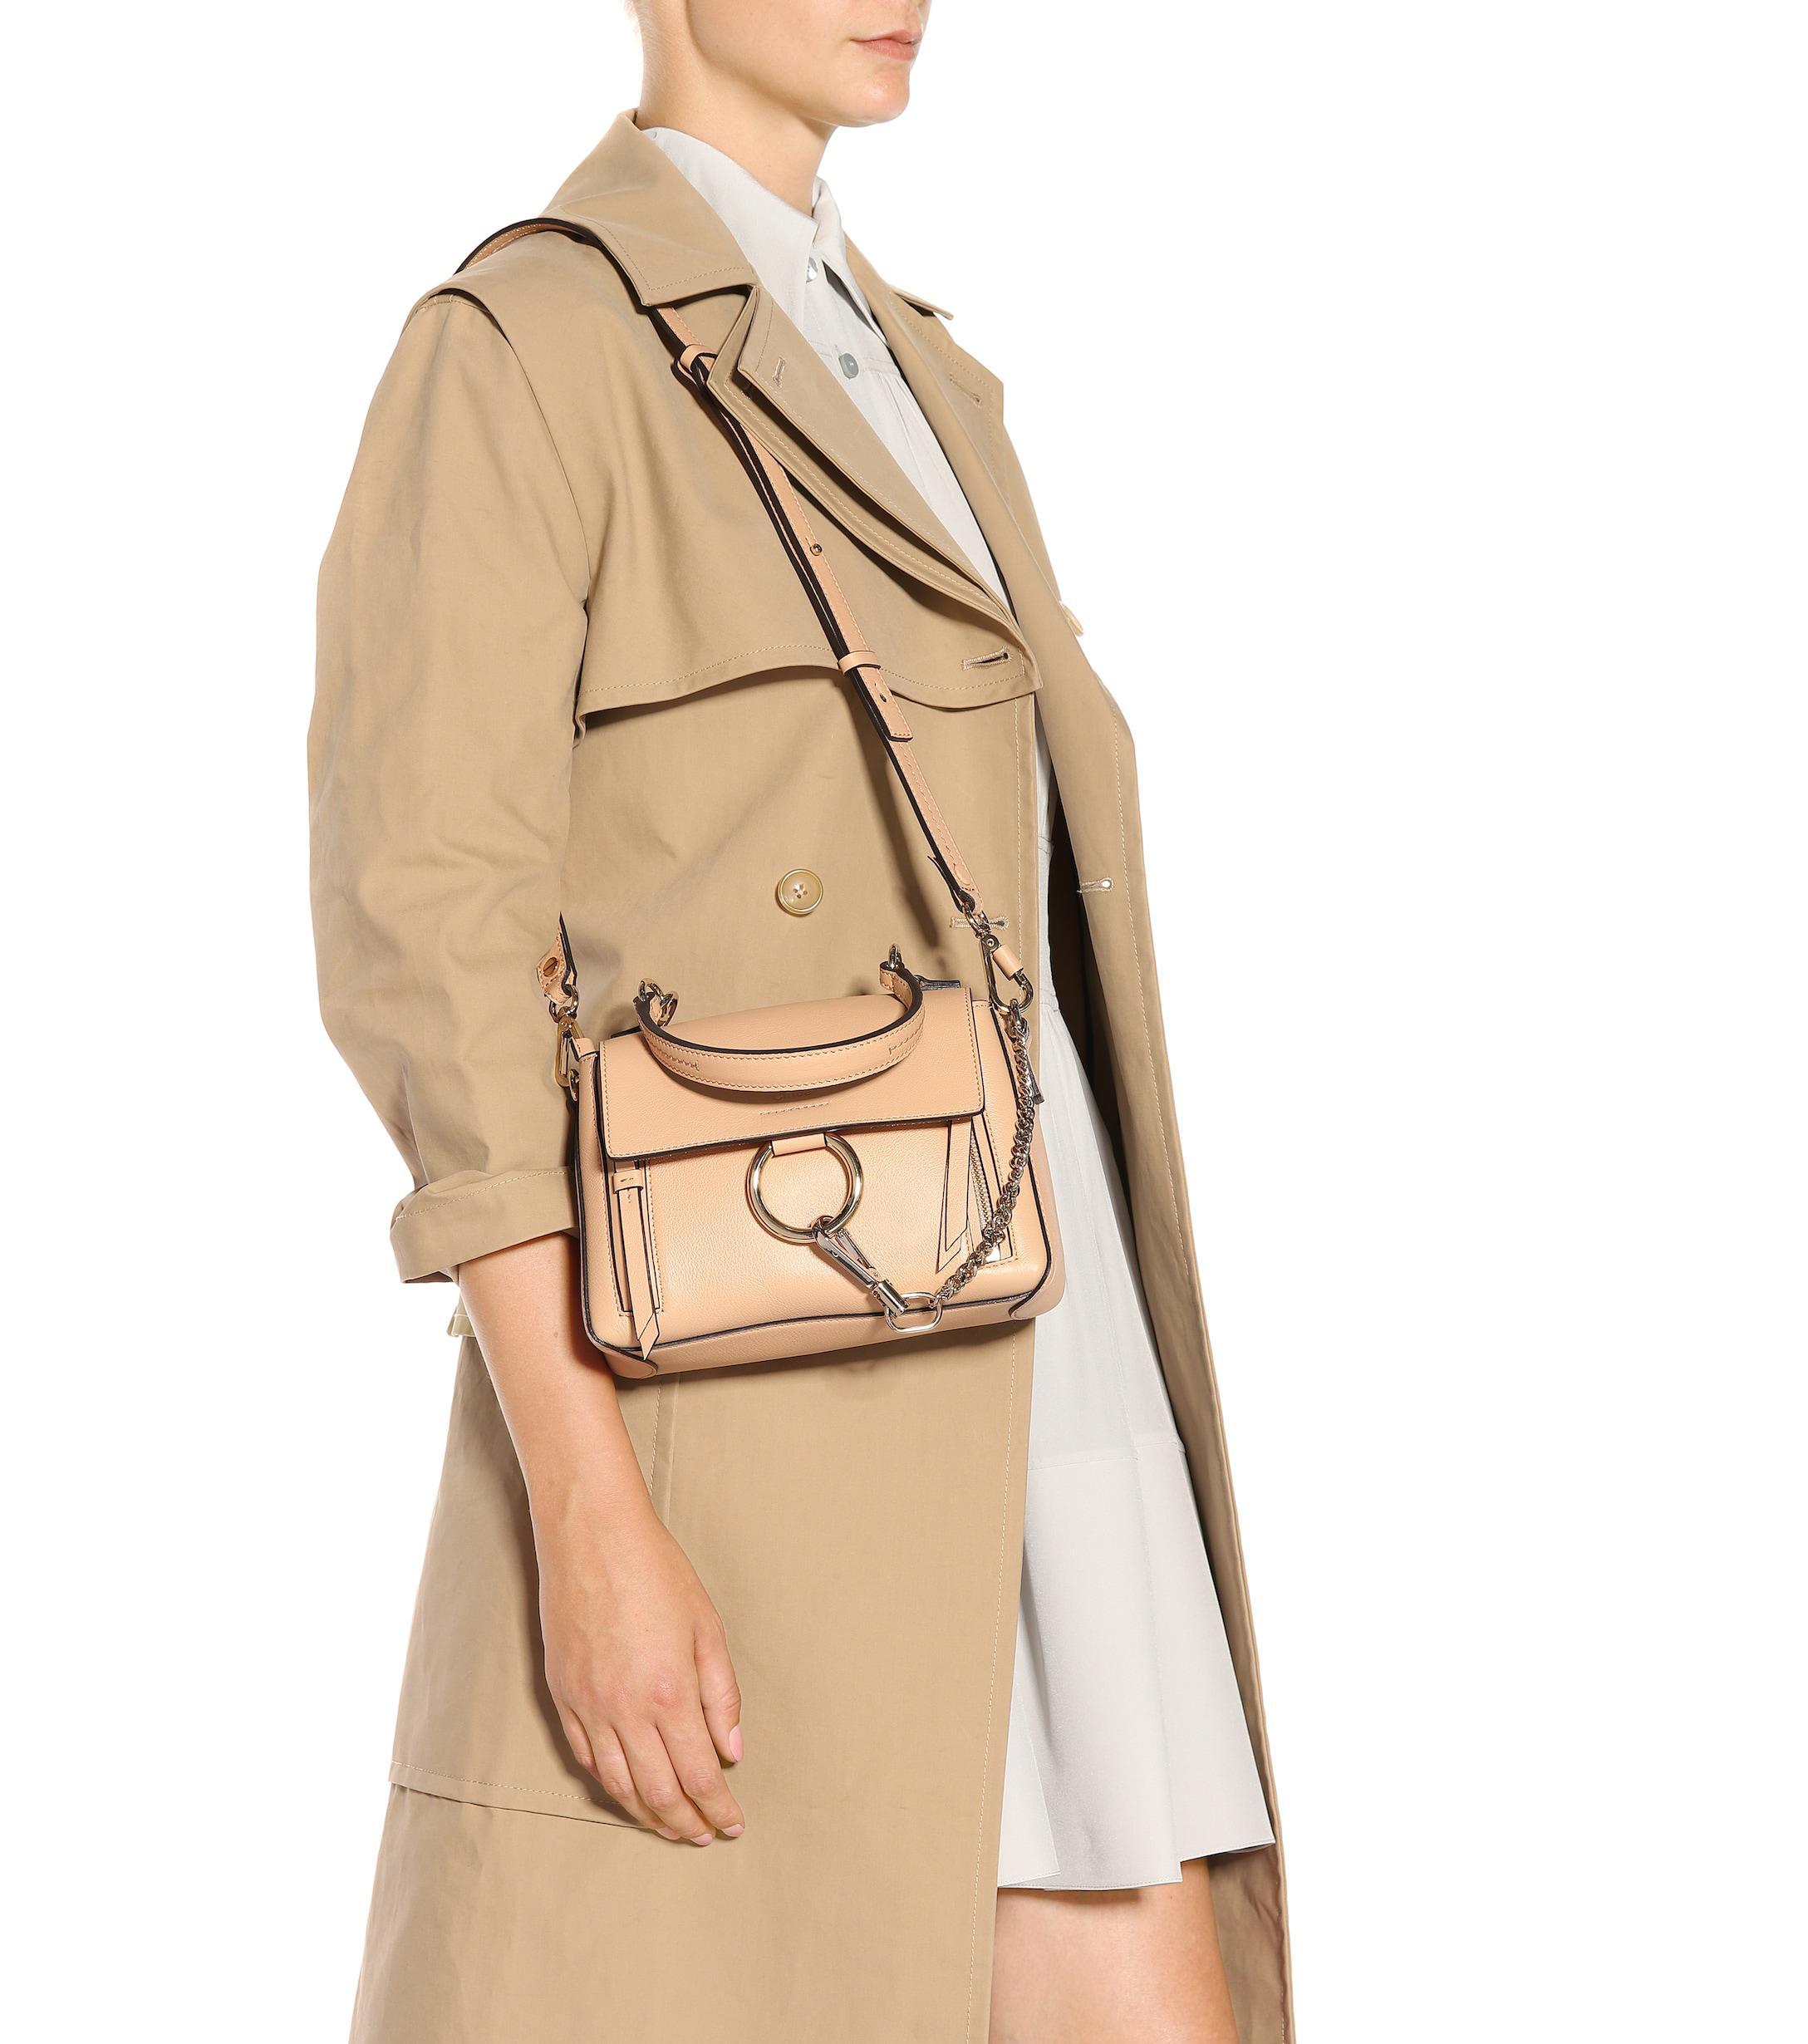 b807fb18ade4 chloe-blush-nude-Mini-Faye-Day-Leather-Shoulder-Bag.jpeg